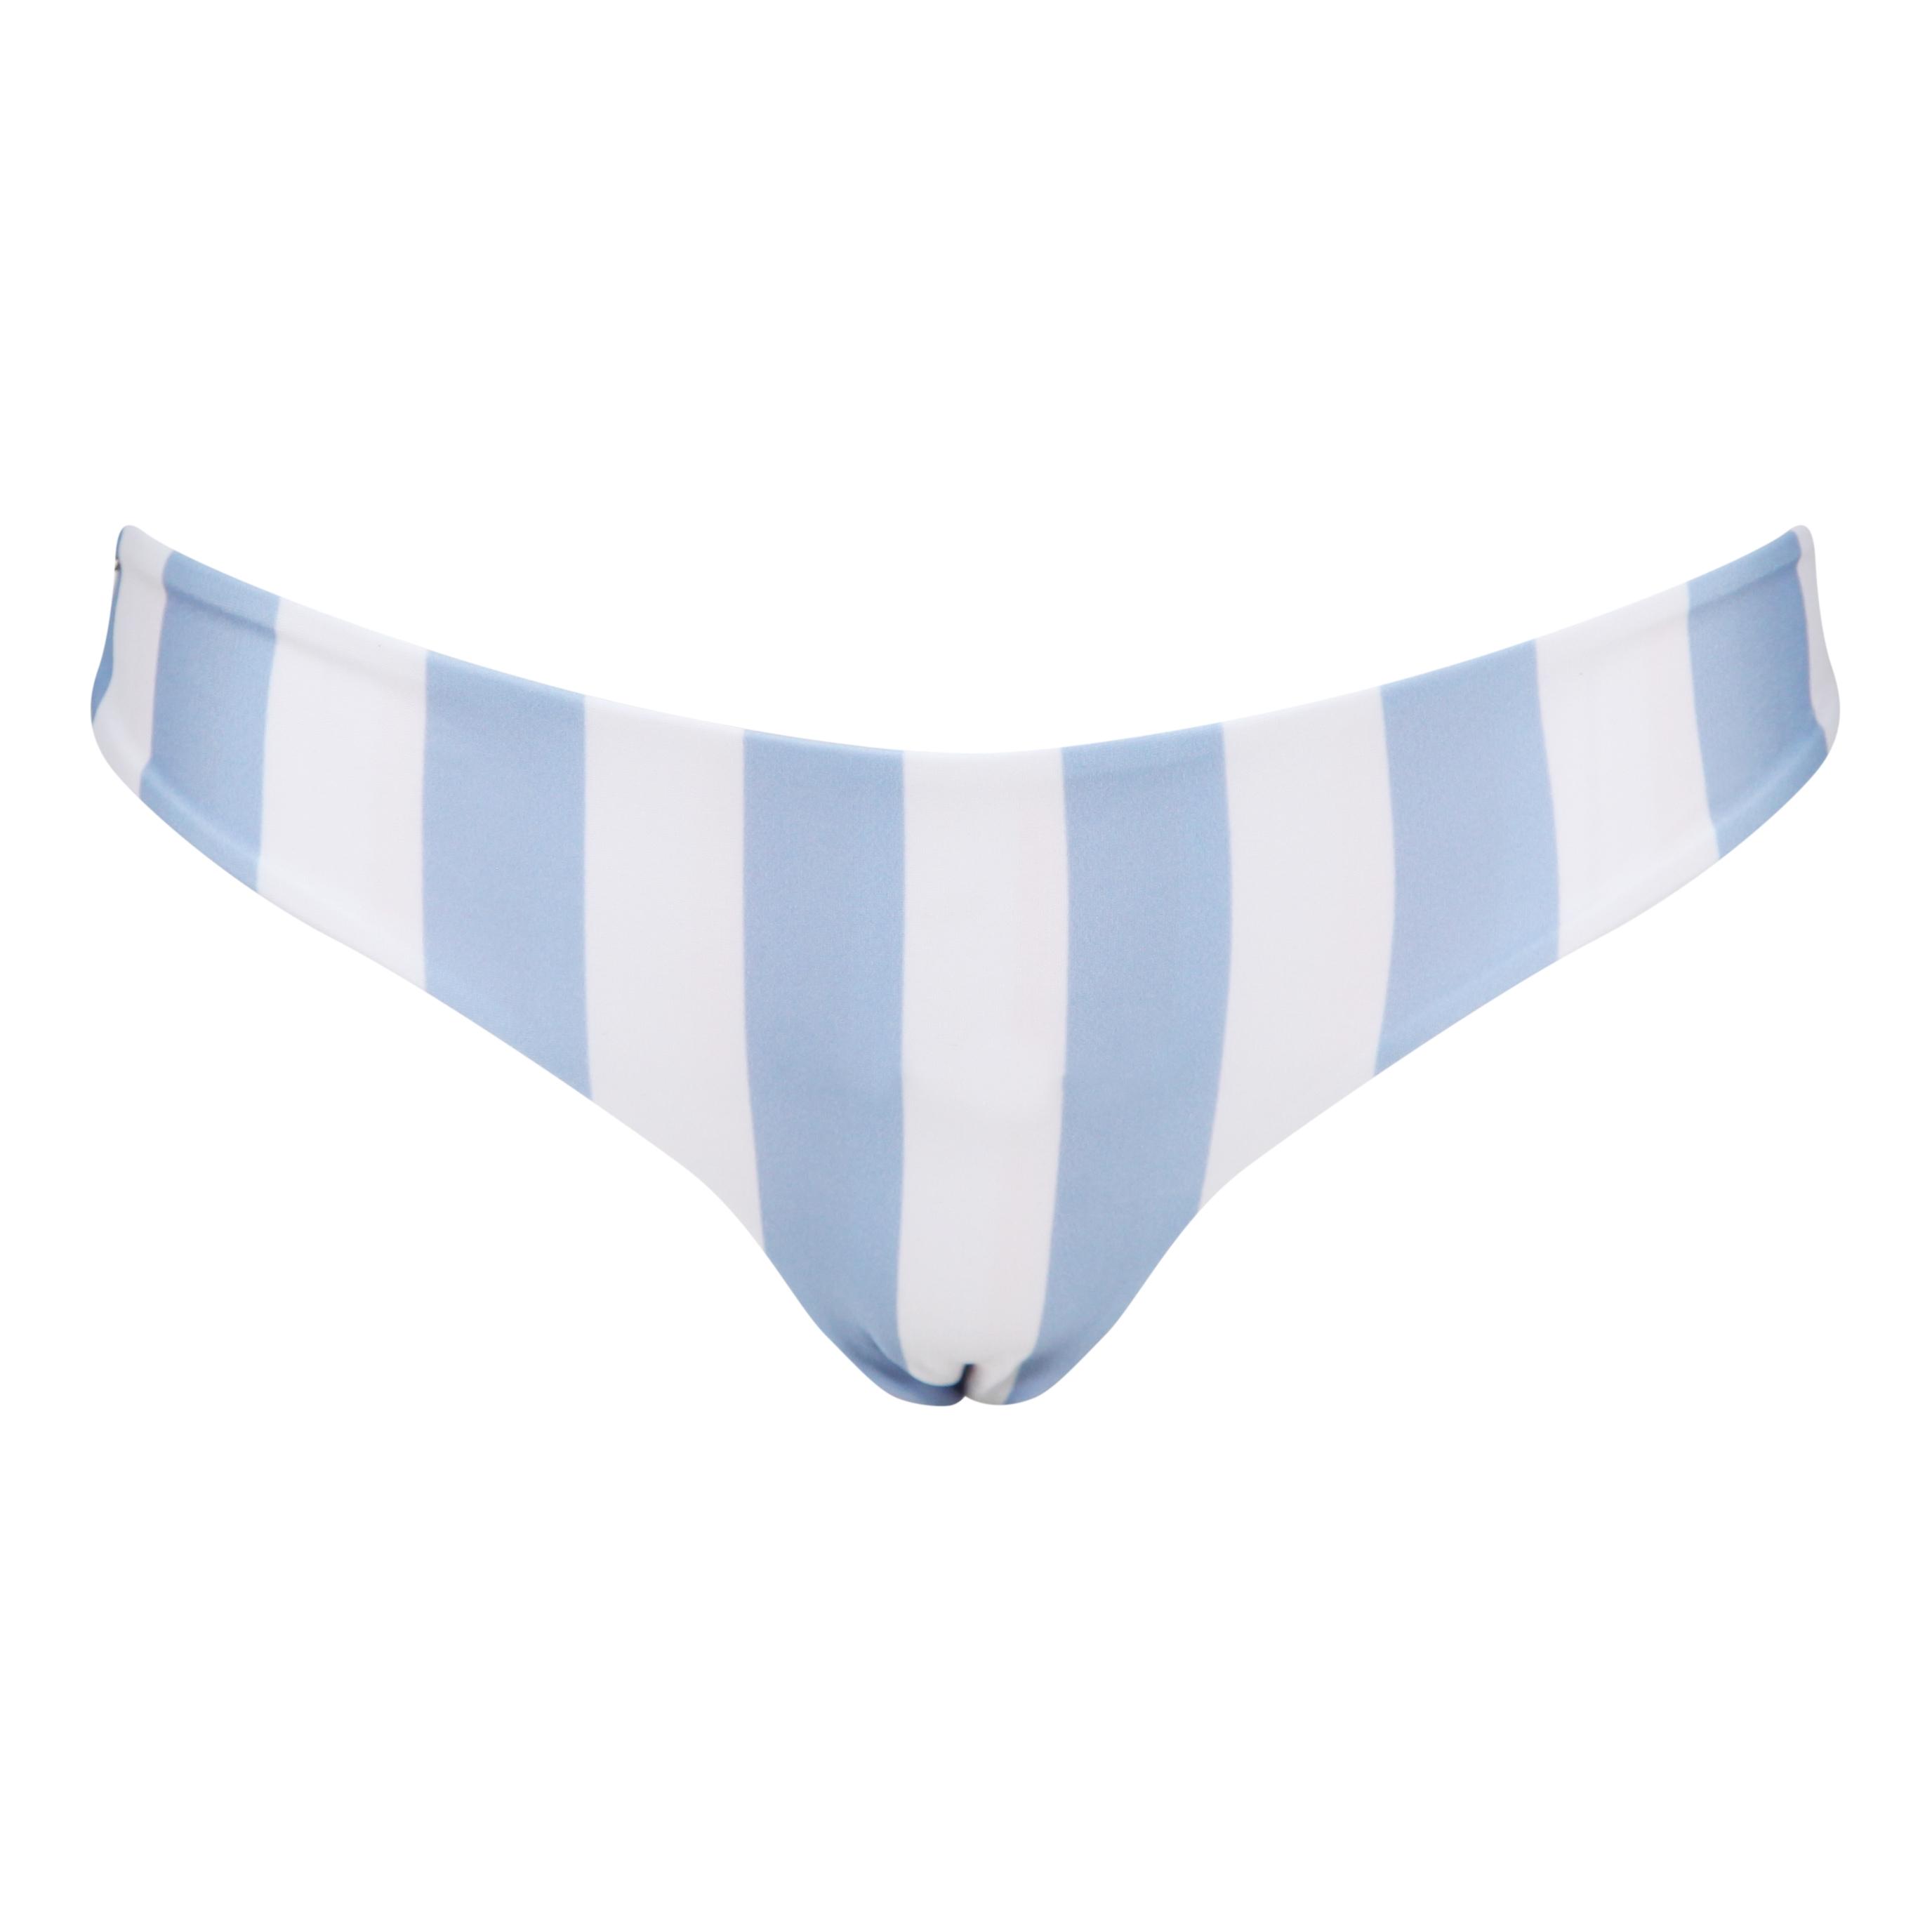 MARBLE SWIMWEAR MISTRAL BOTTOMS - SERENITY BLUE - ROSE PINK